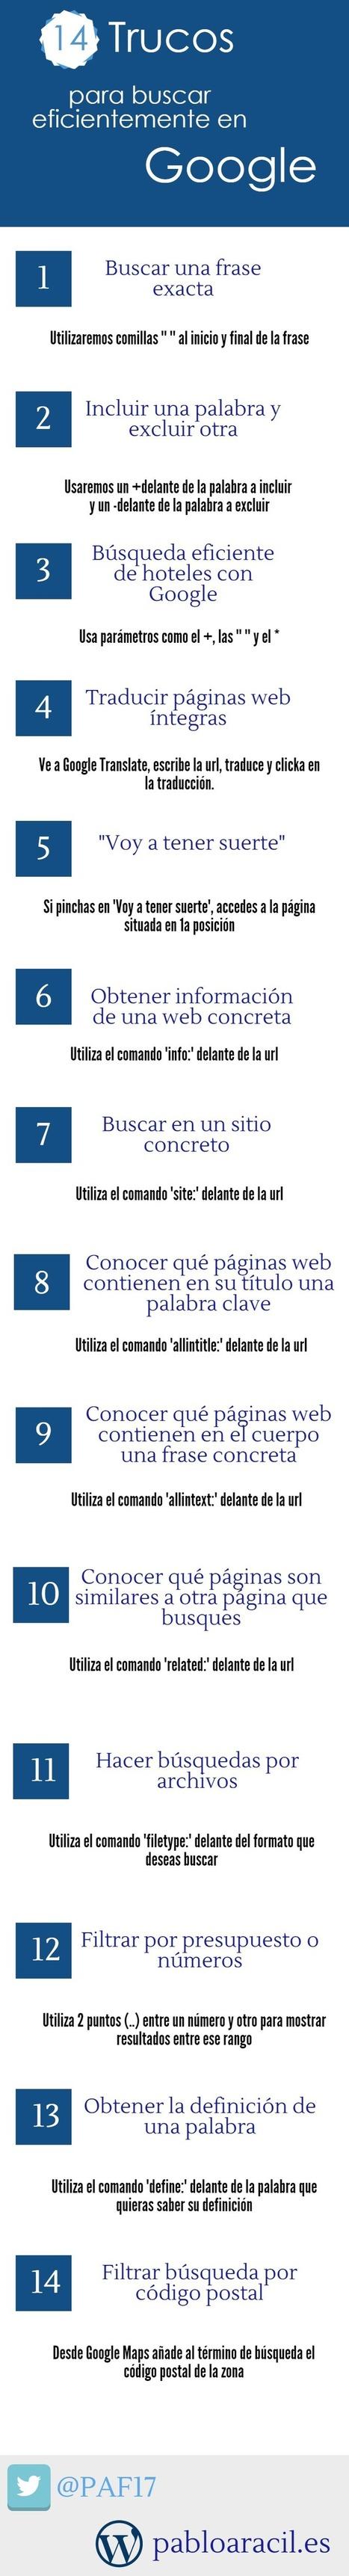 14 trucos pra buscar eficientemente en Google #infografia #infographic | Llengua i noves tecnologies | Scoop.it